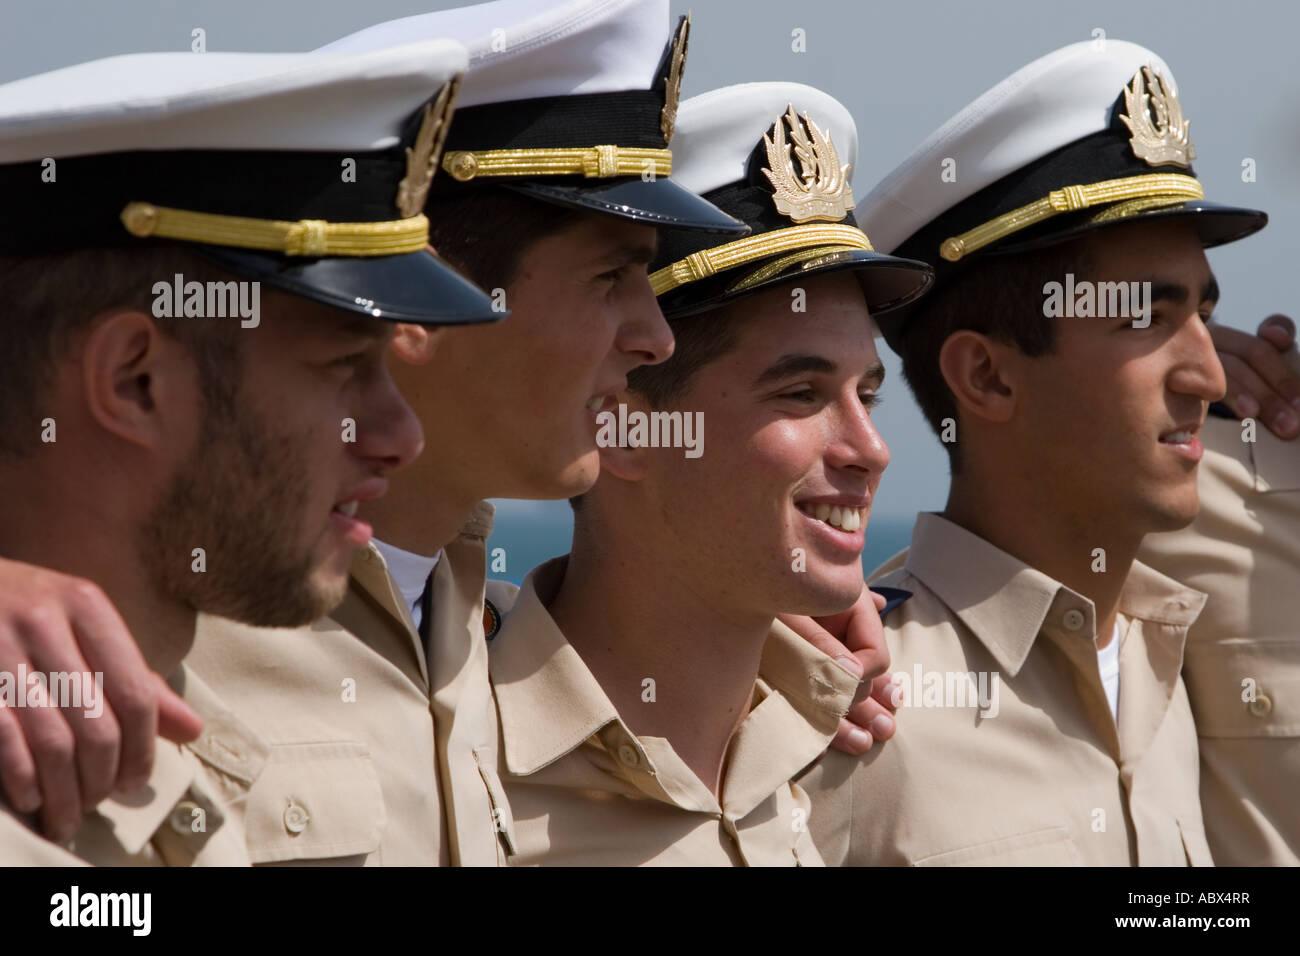 Stock Photo Closeup Portrait of Four Israeli Navy Cadets soldier soldiers four quad portrait comradeship affiliation - Stock Image